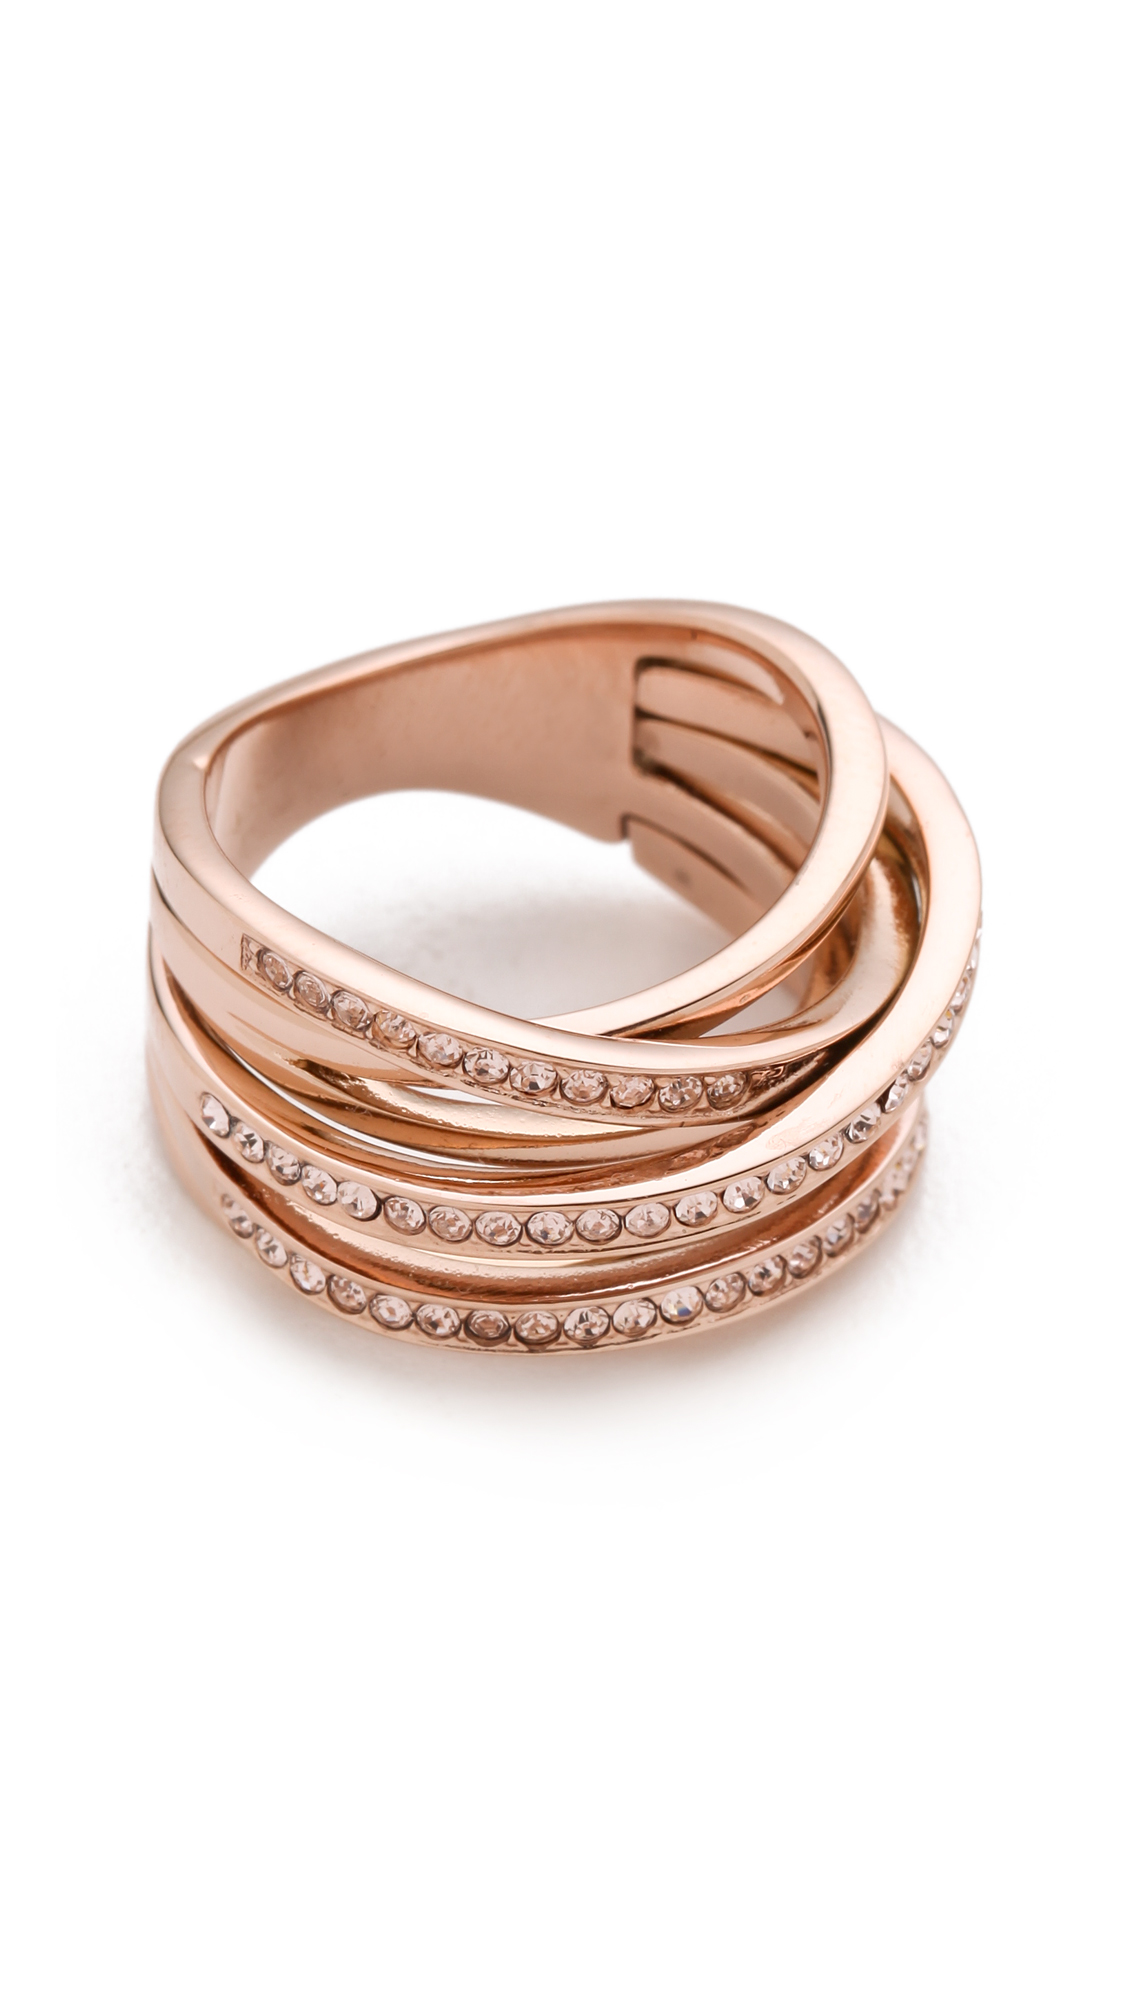 Michael Kors Pave Stack Ring In Metallic Lyst